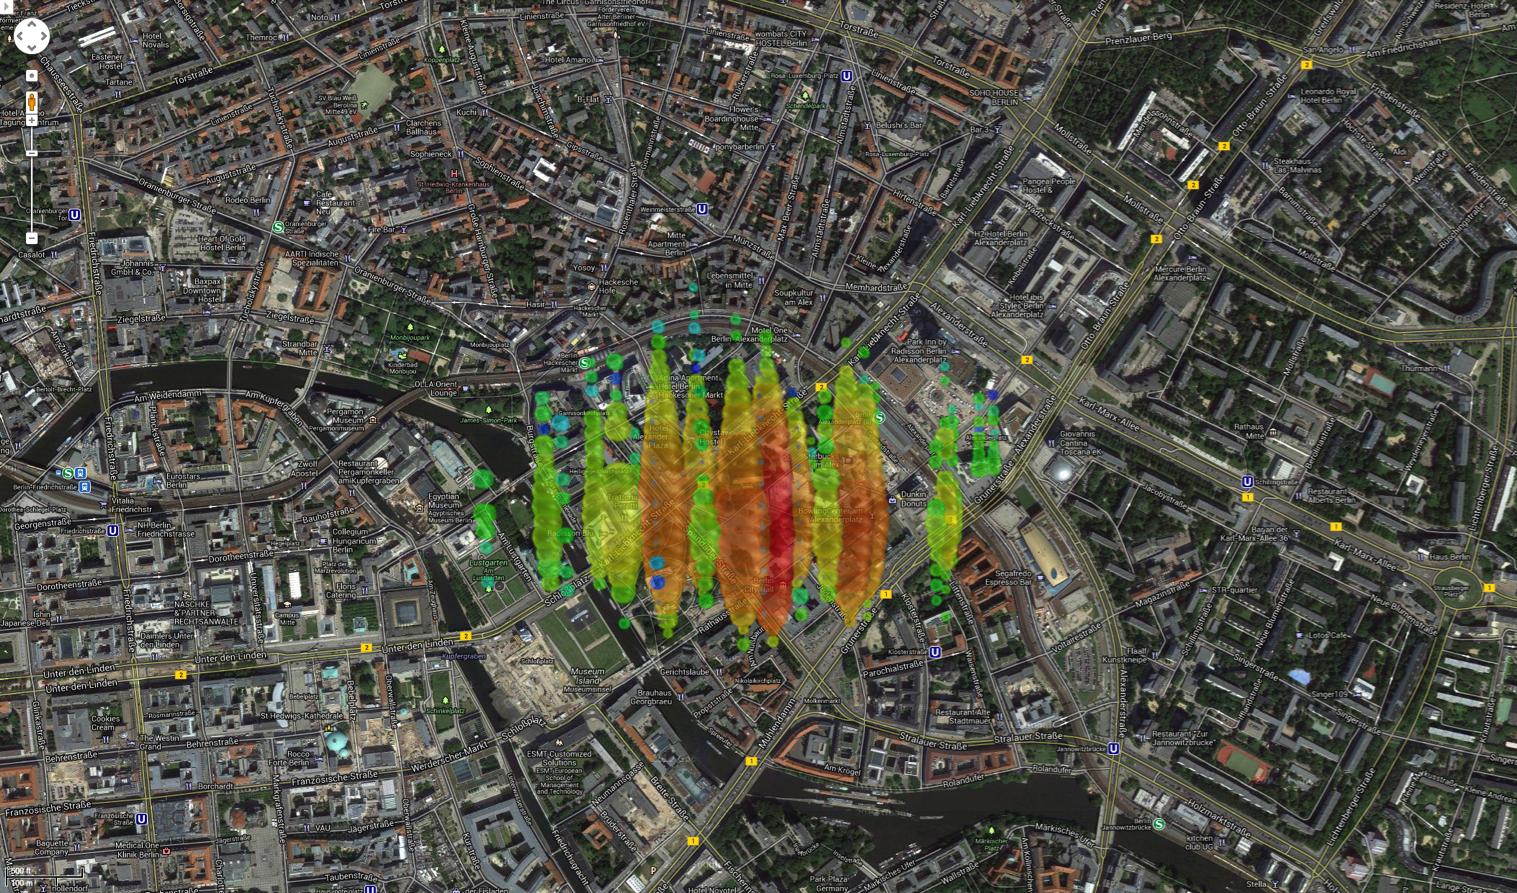 A high-energy neutrino over Berlin, Germany